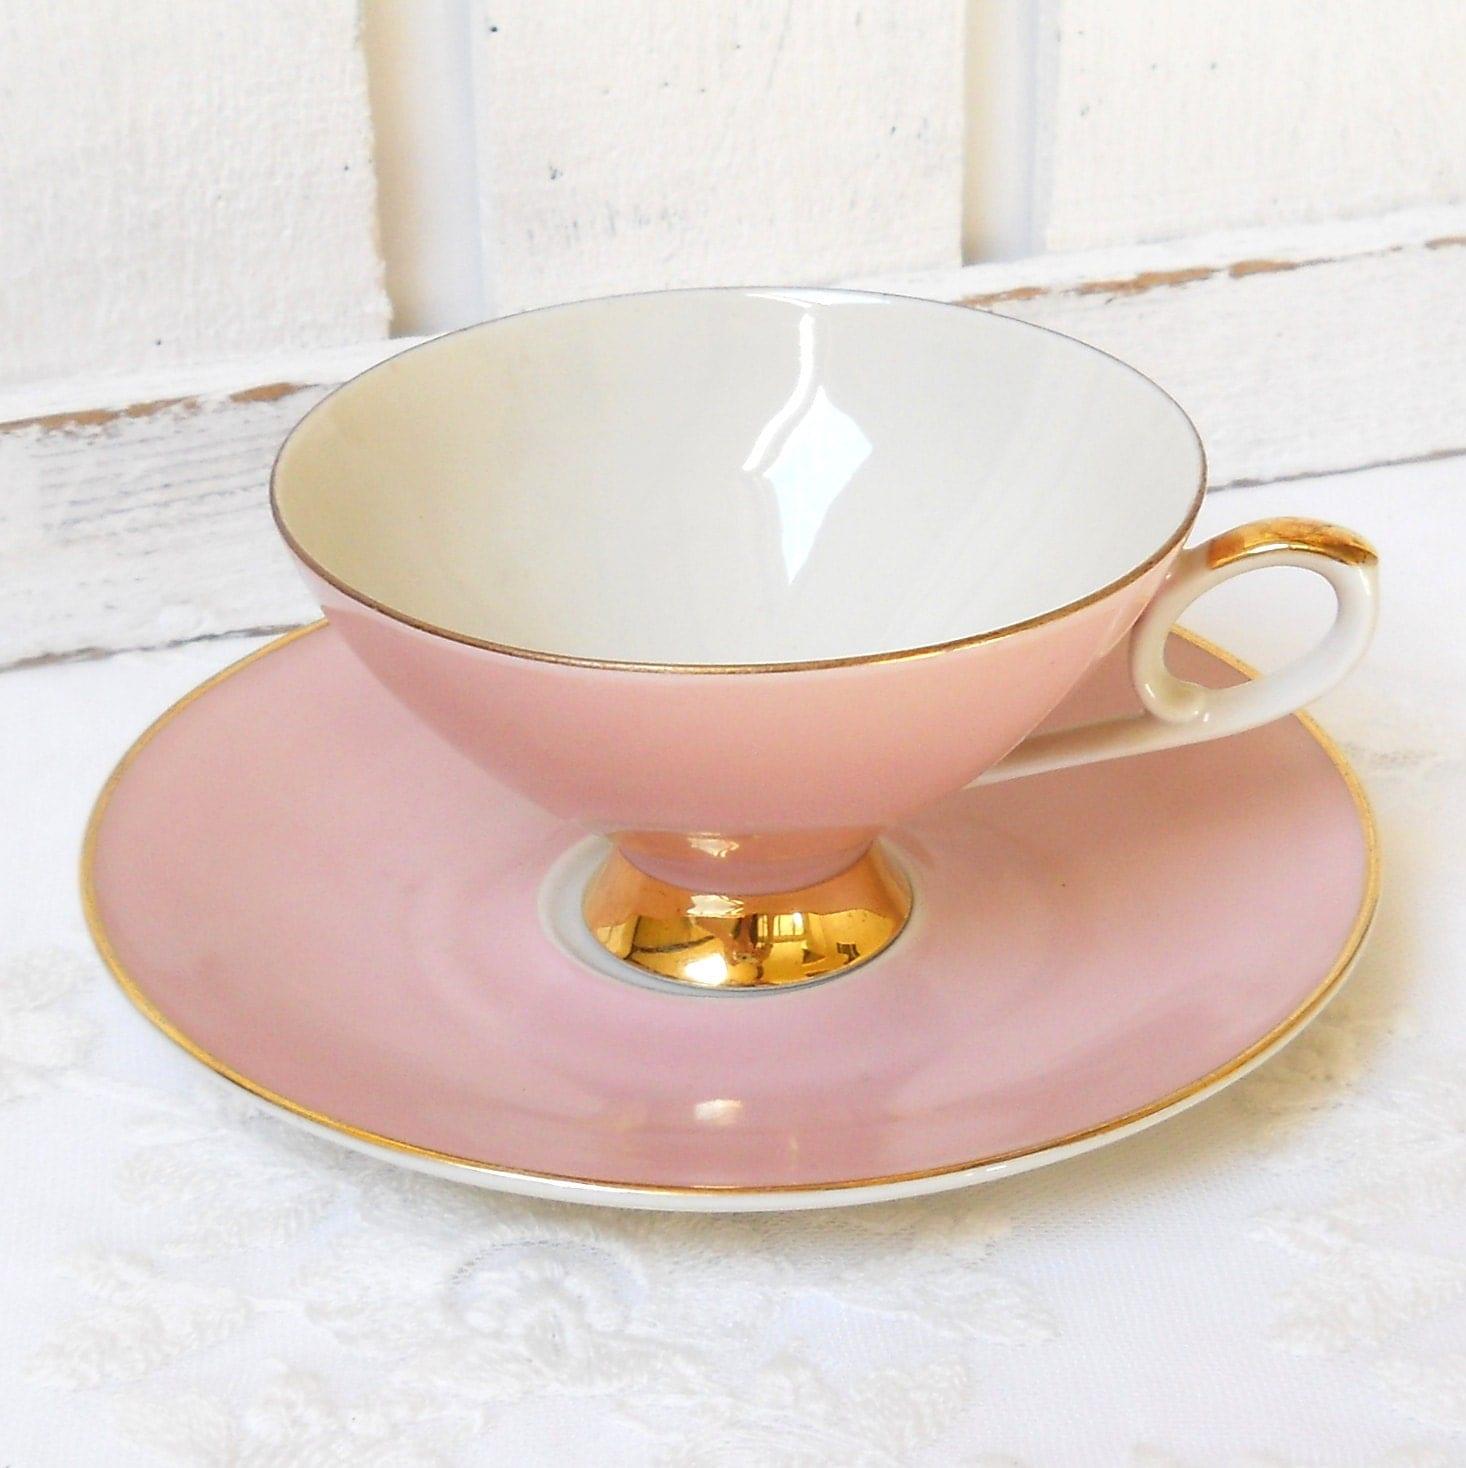 vintage teacup tea cup - photo #3